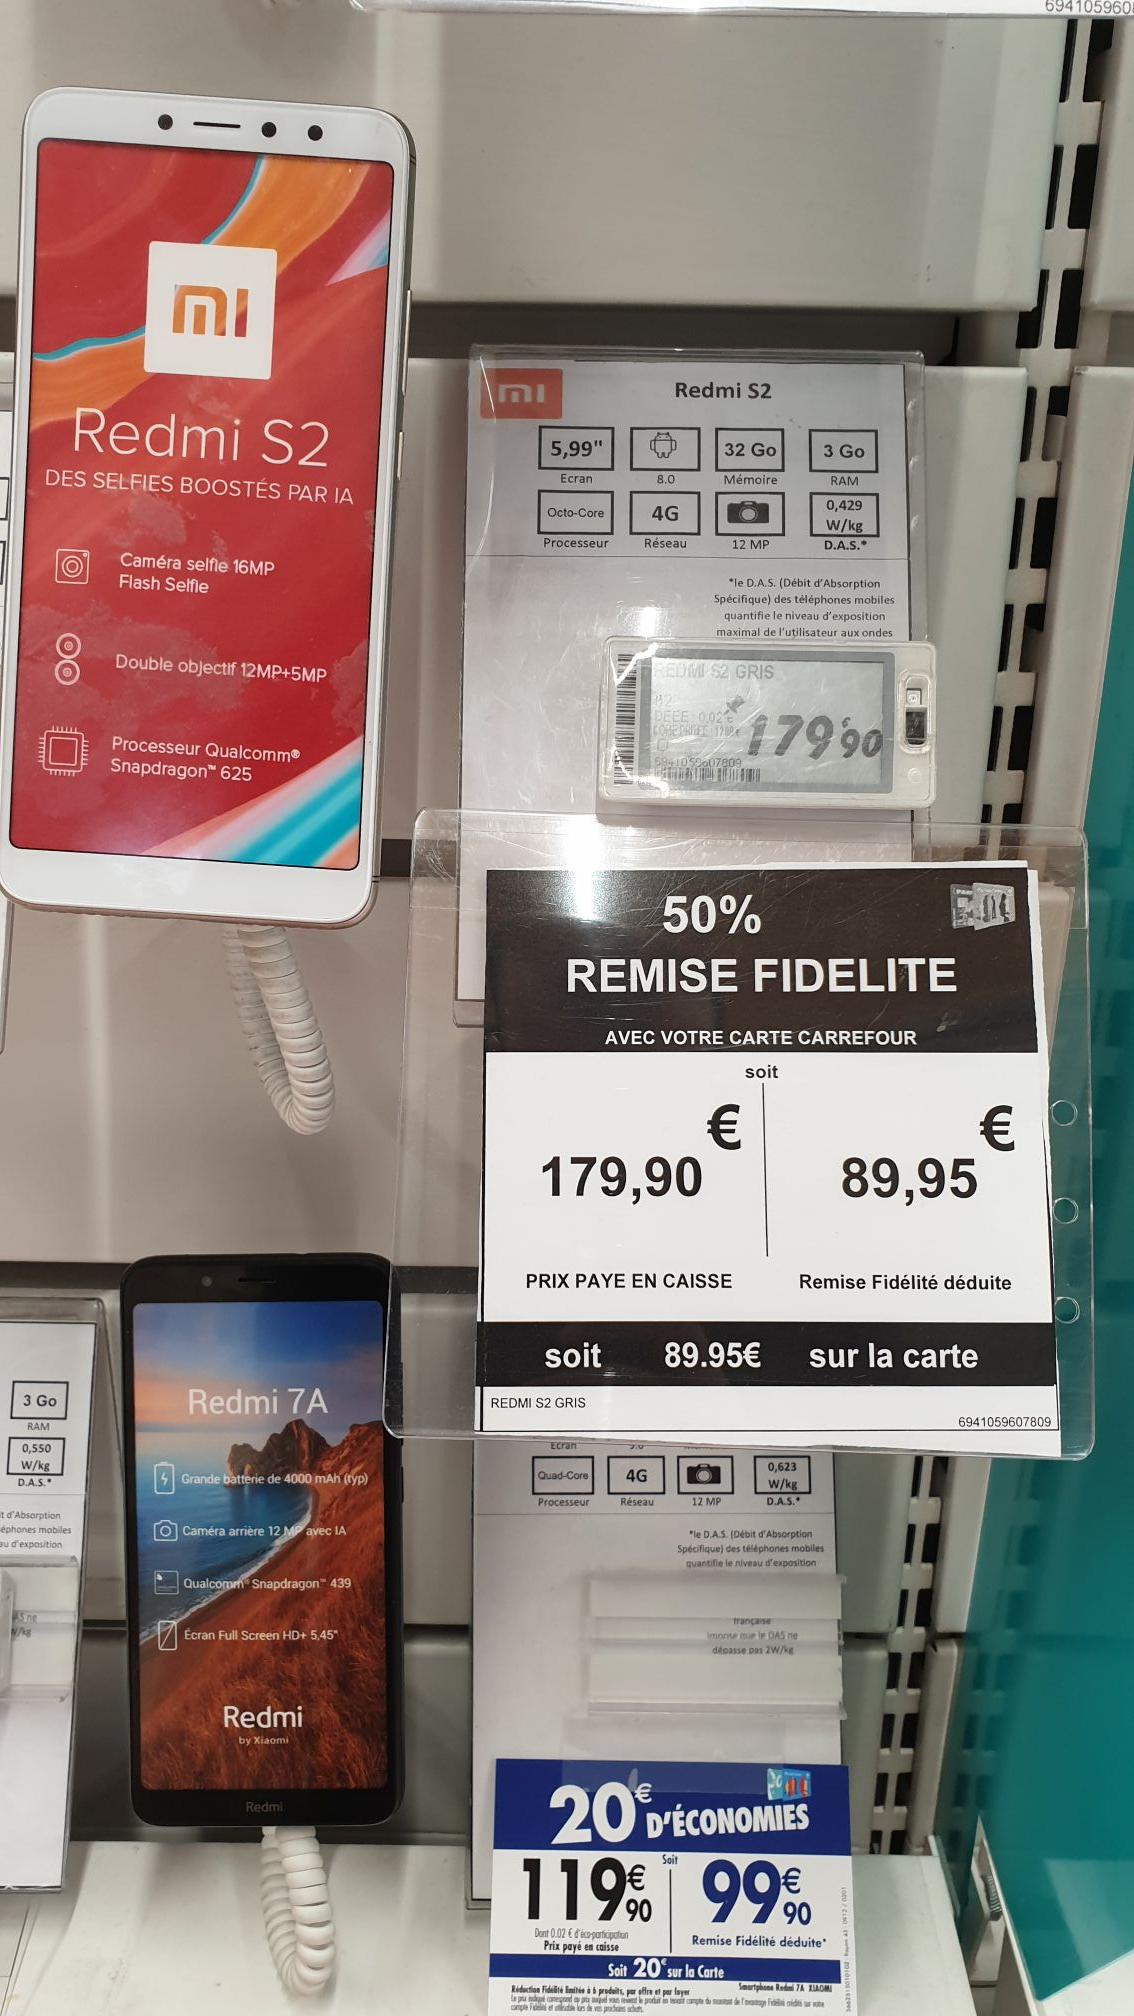 "Smartphone 5.99"" Xiaomi Redmi S2 - Carrefour de Villeneuve-la-Garenne (92)"